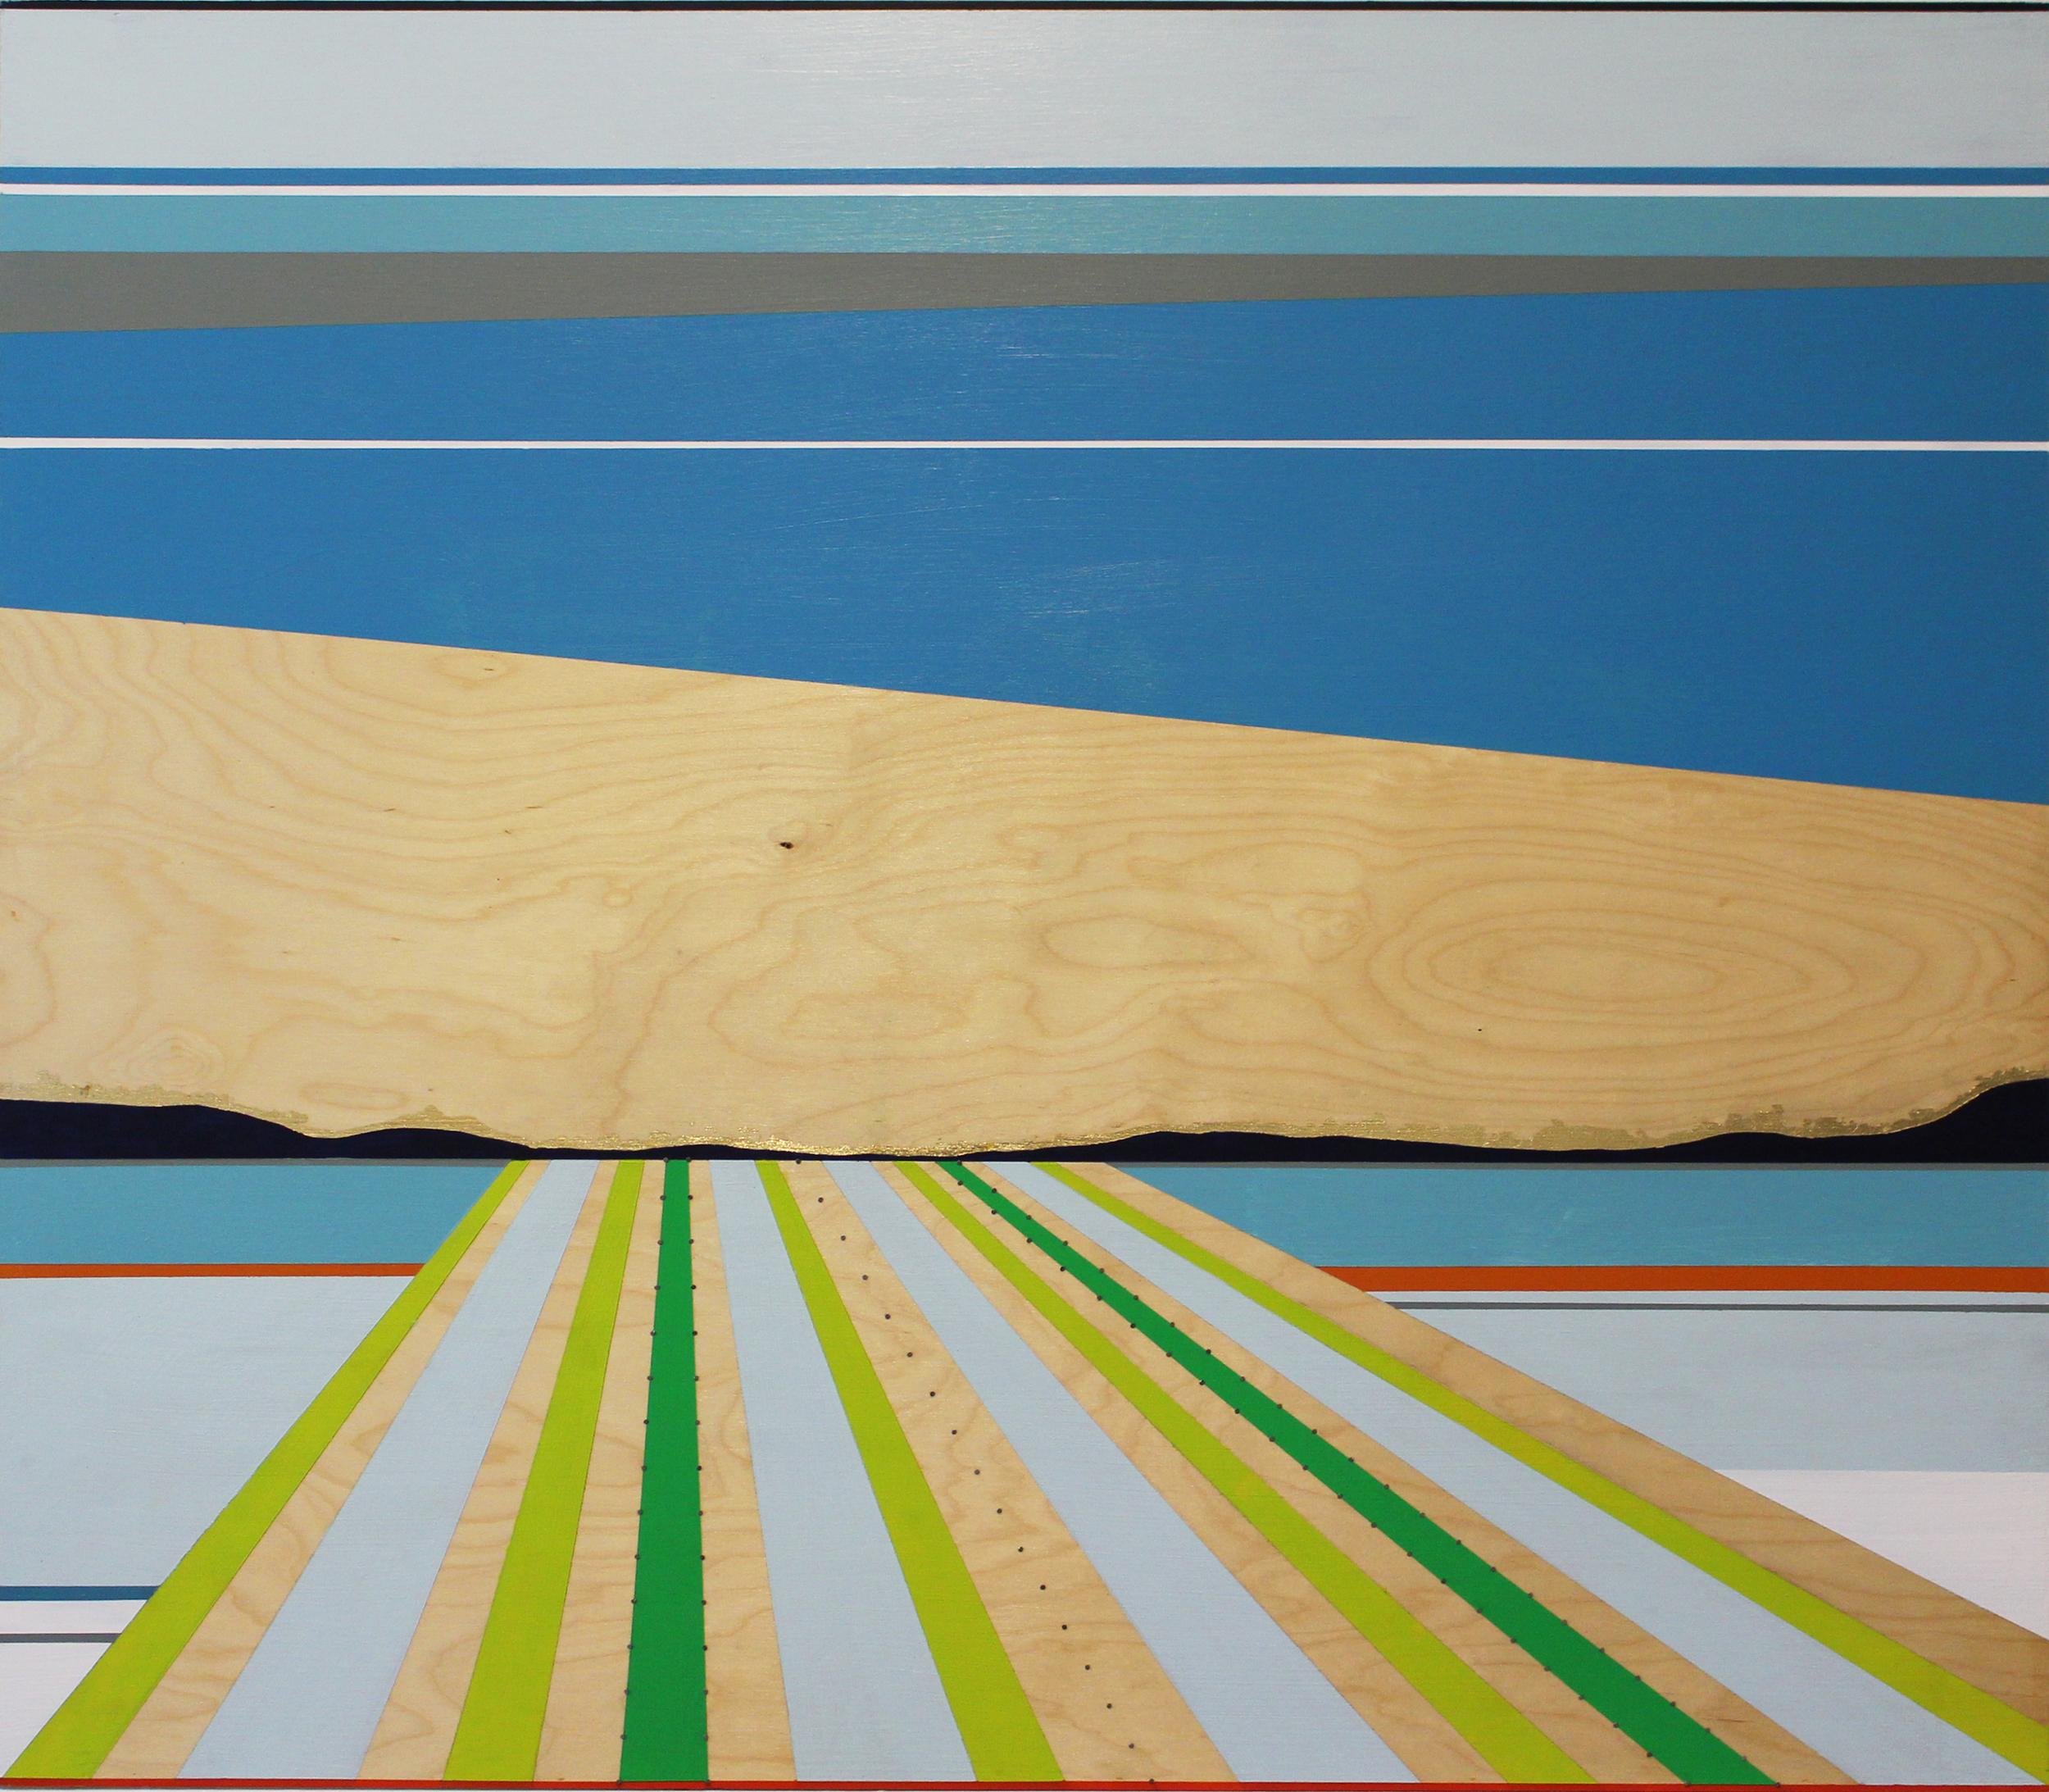 Kishita_Landing_acrylic_nails_gold leaf on wood panel_40x46_2100.jpg